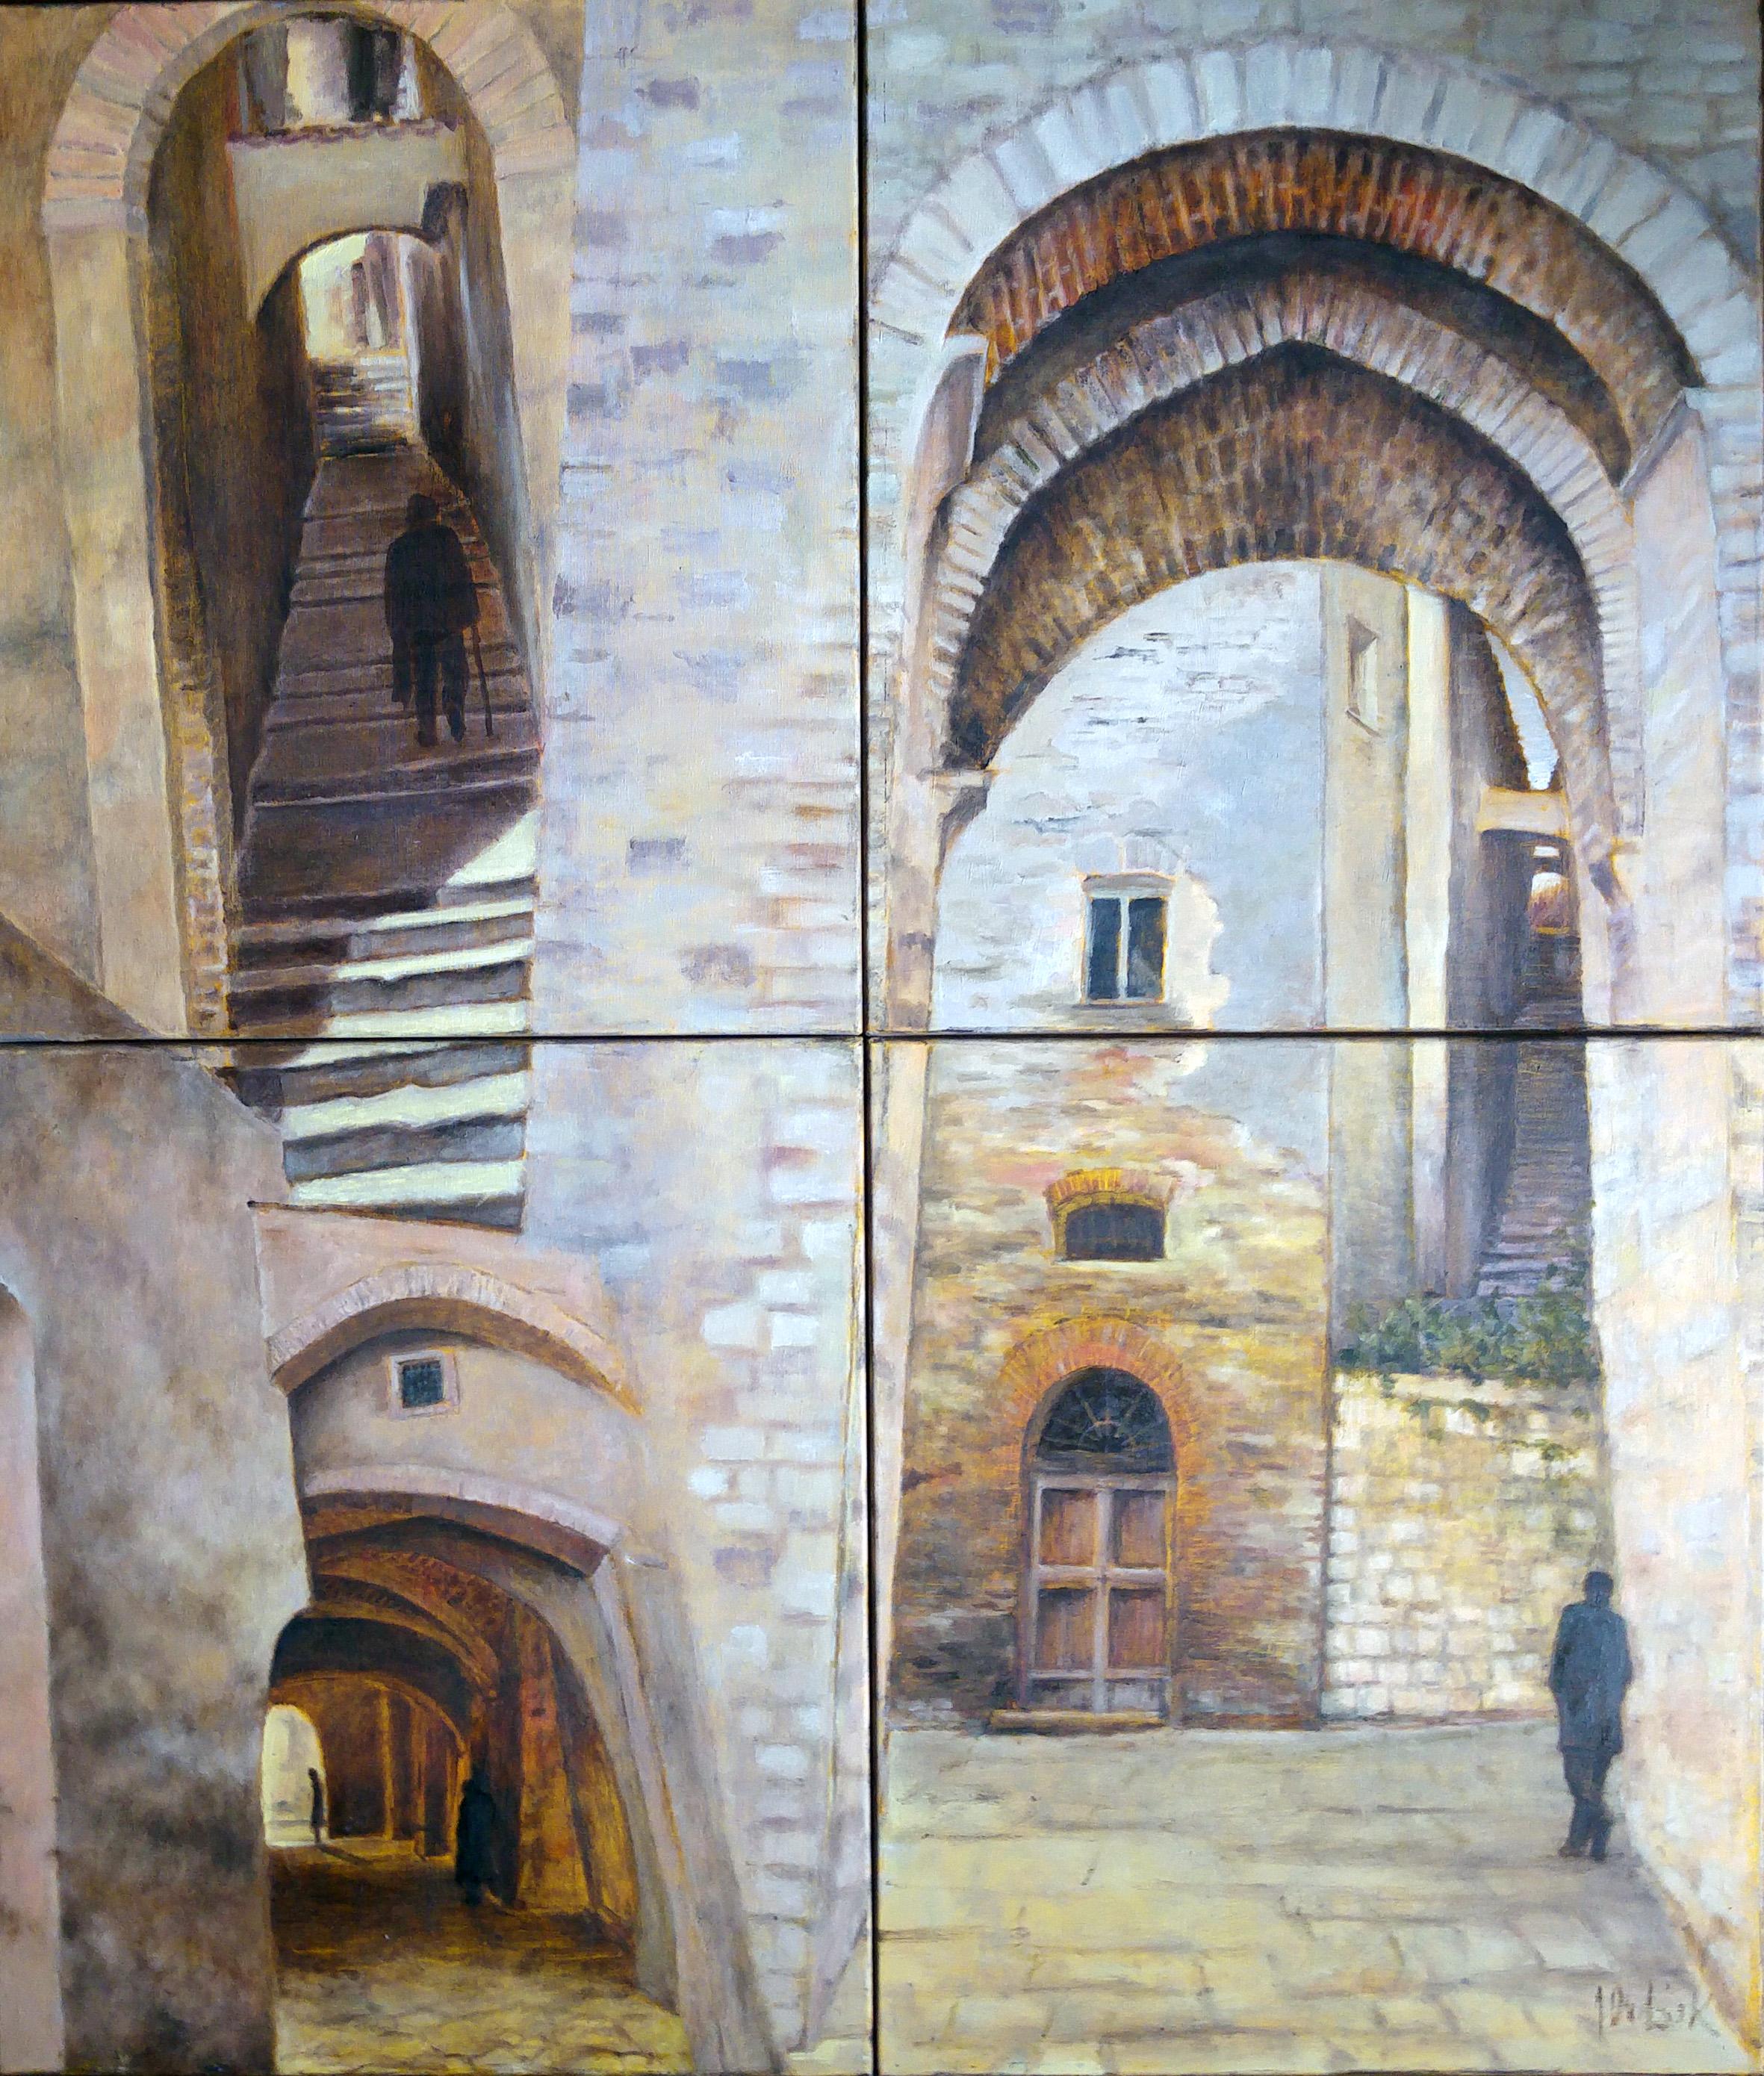 Meandry Ścian, olej, płótno, 120 x 140 cm,